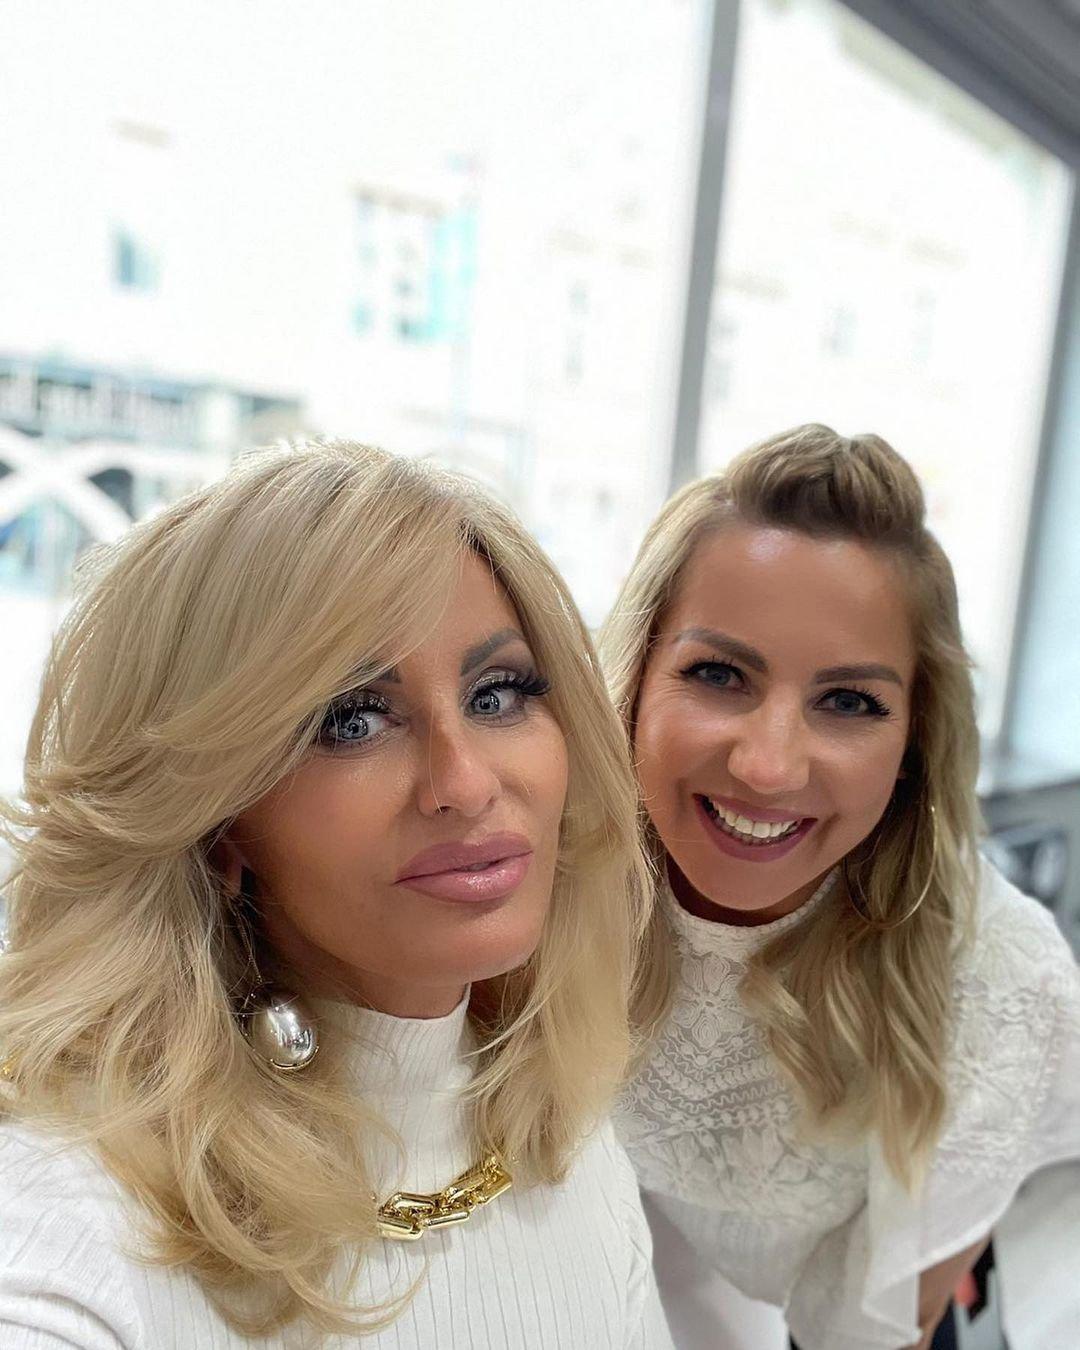 Dagmara Kaźmierska blond